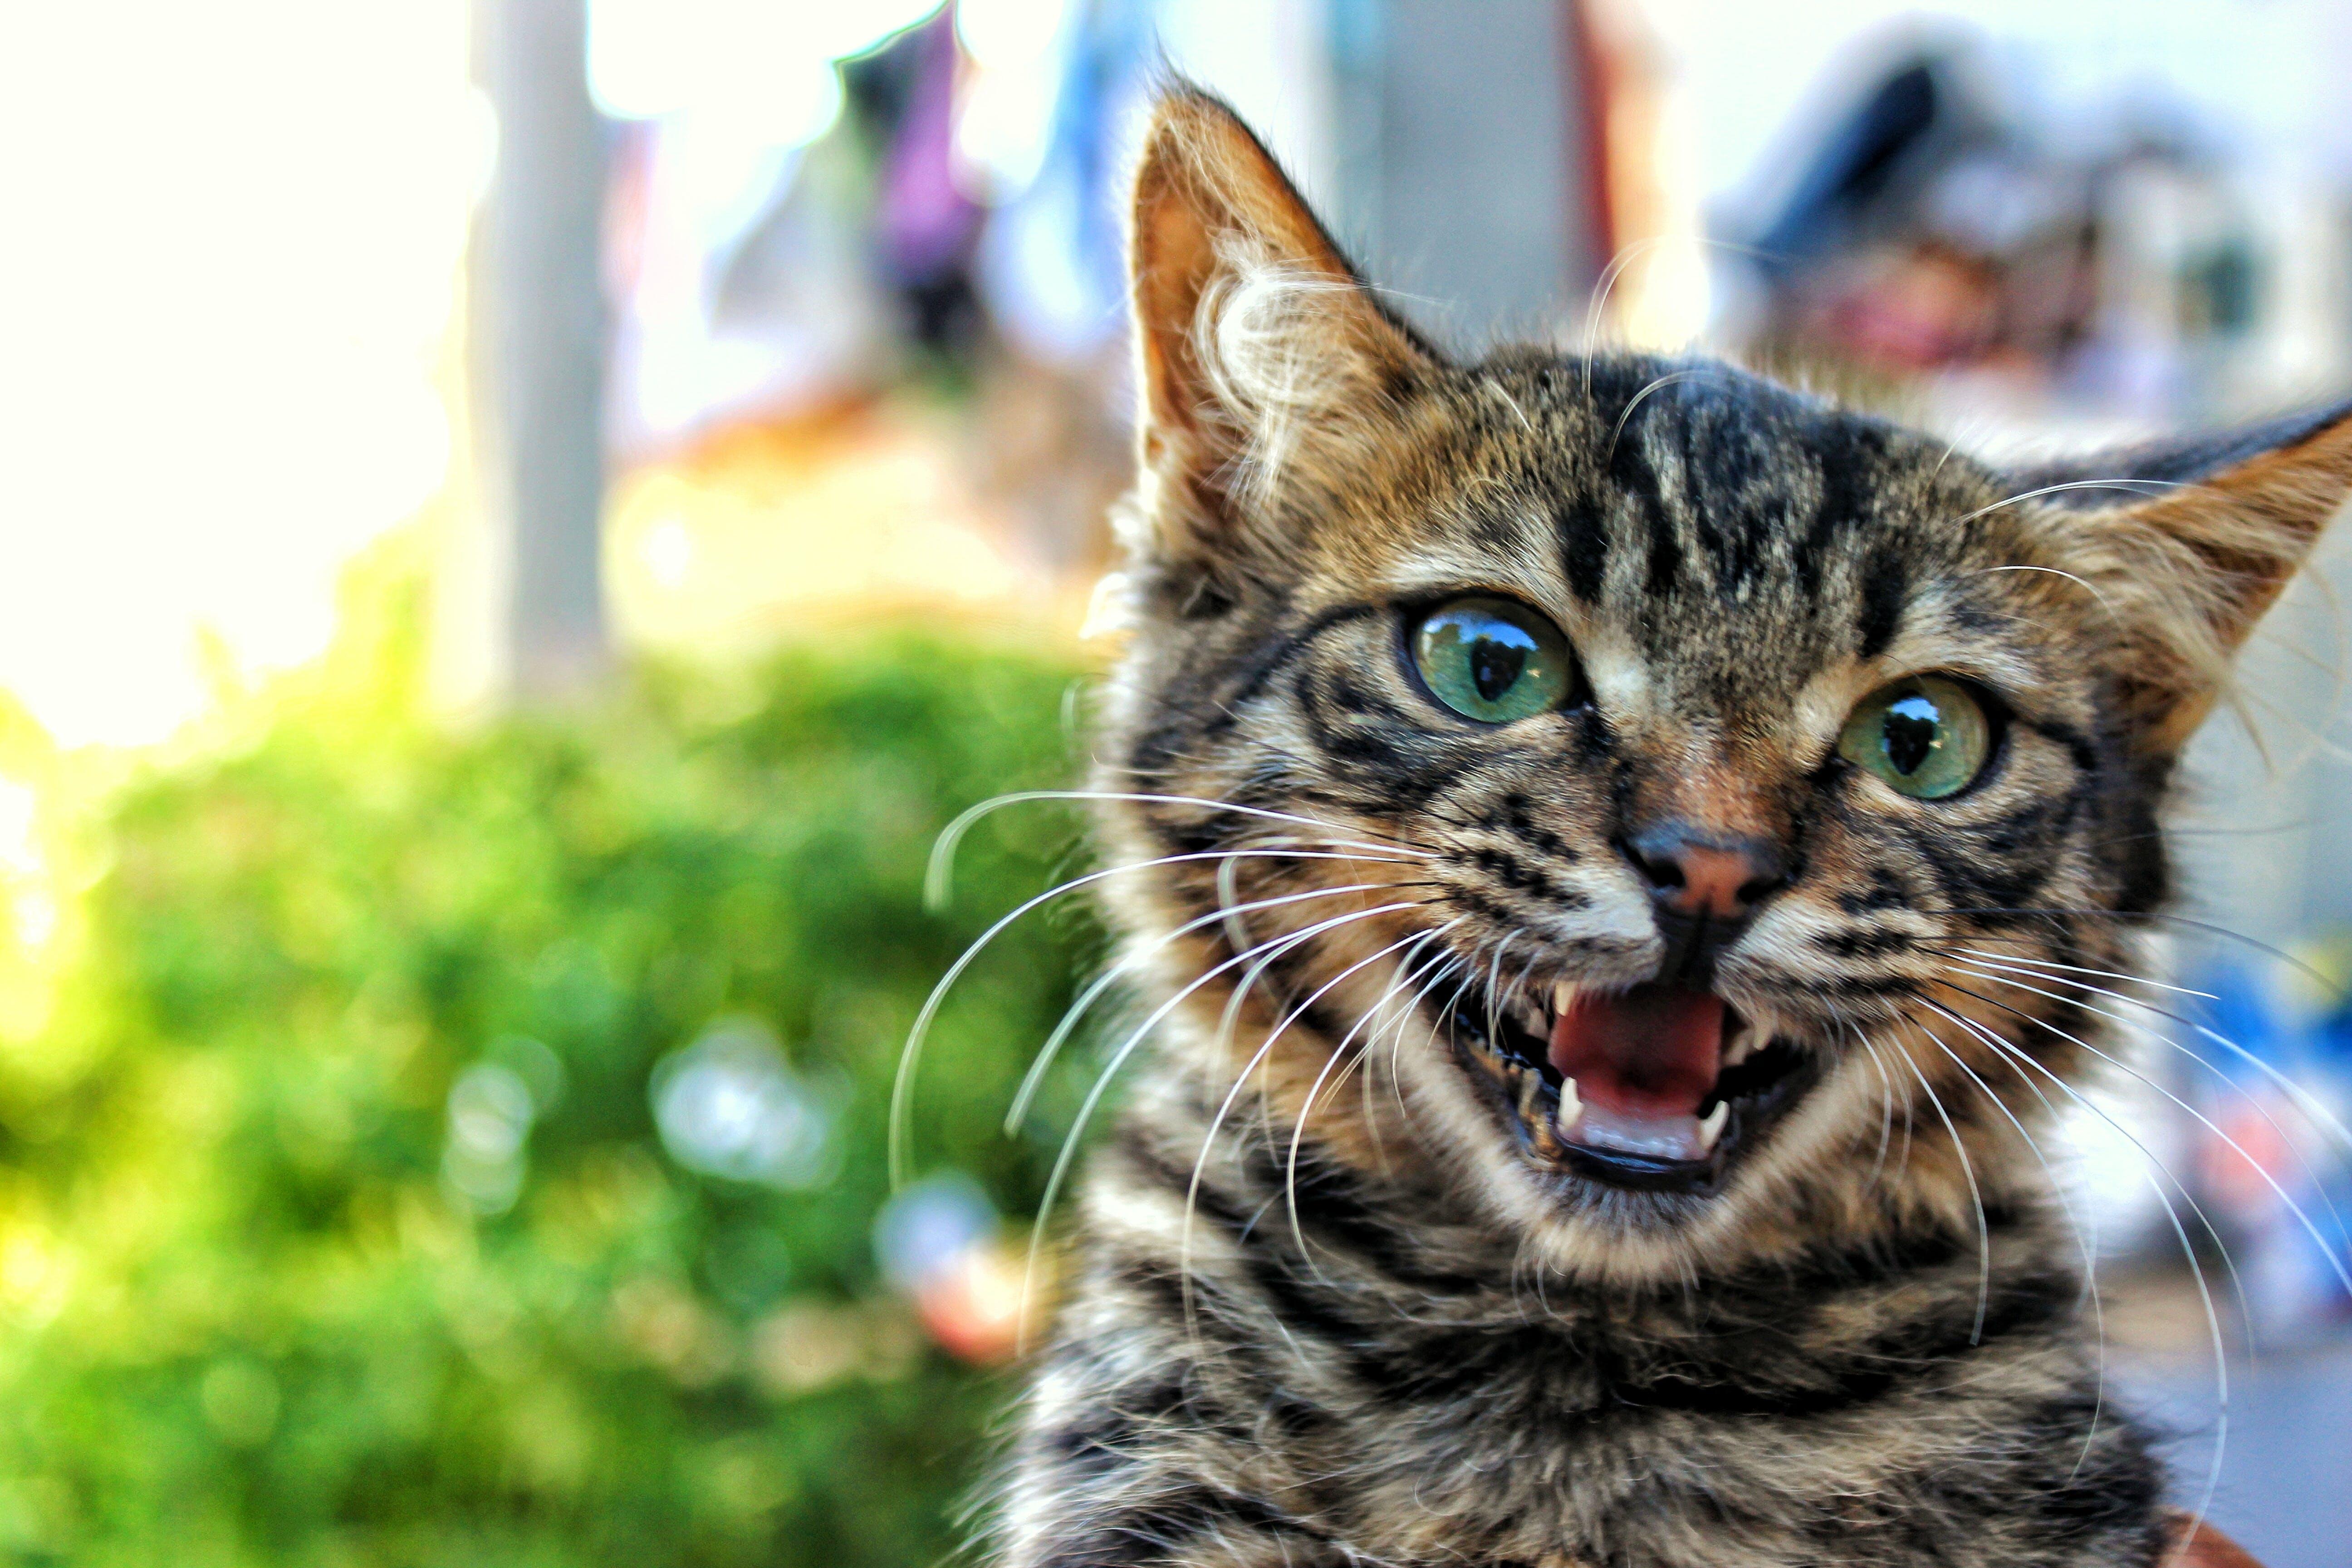 Fotos de stock gratuitas de animal, gatito, gato, mascota